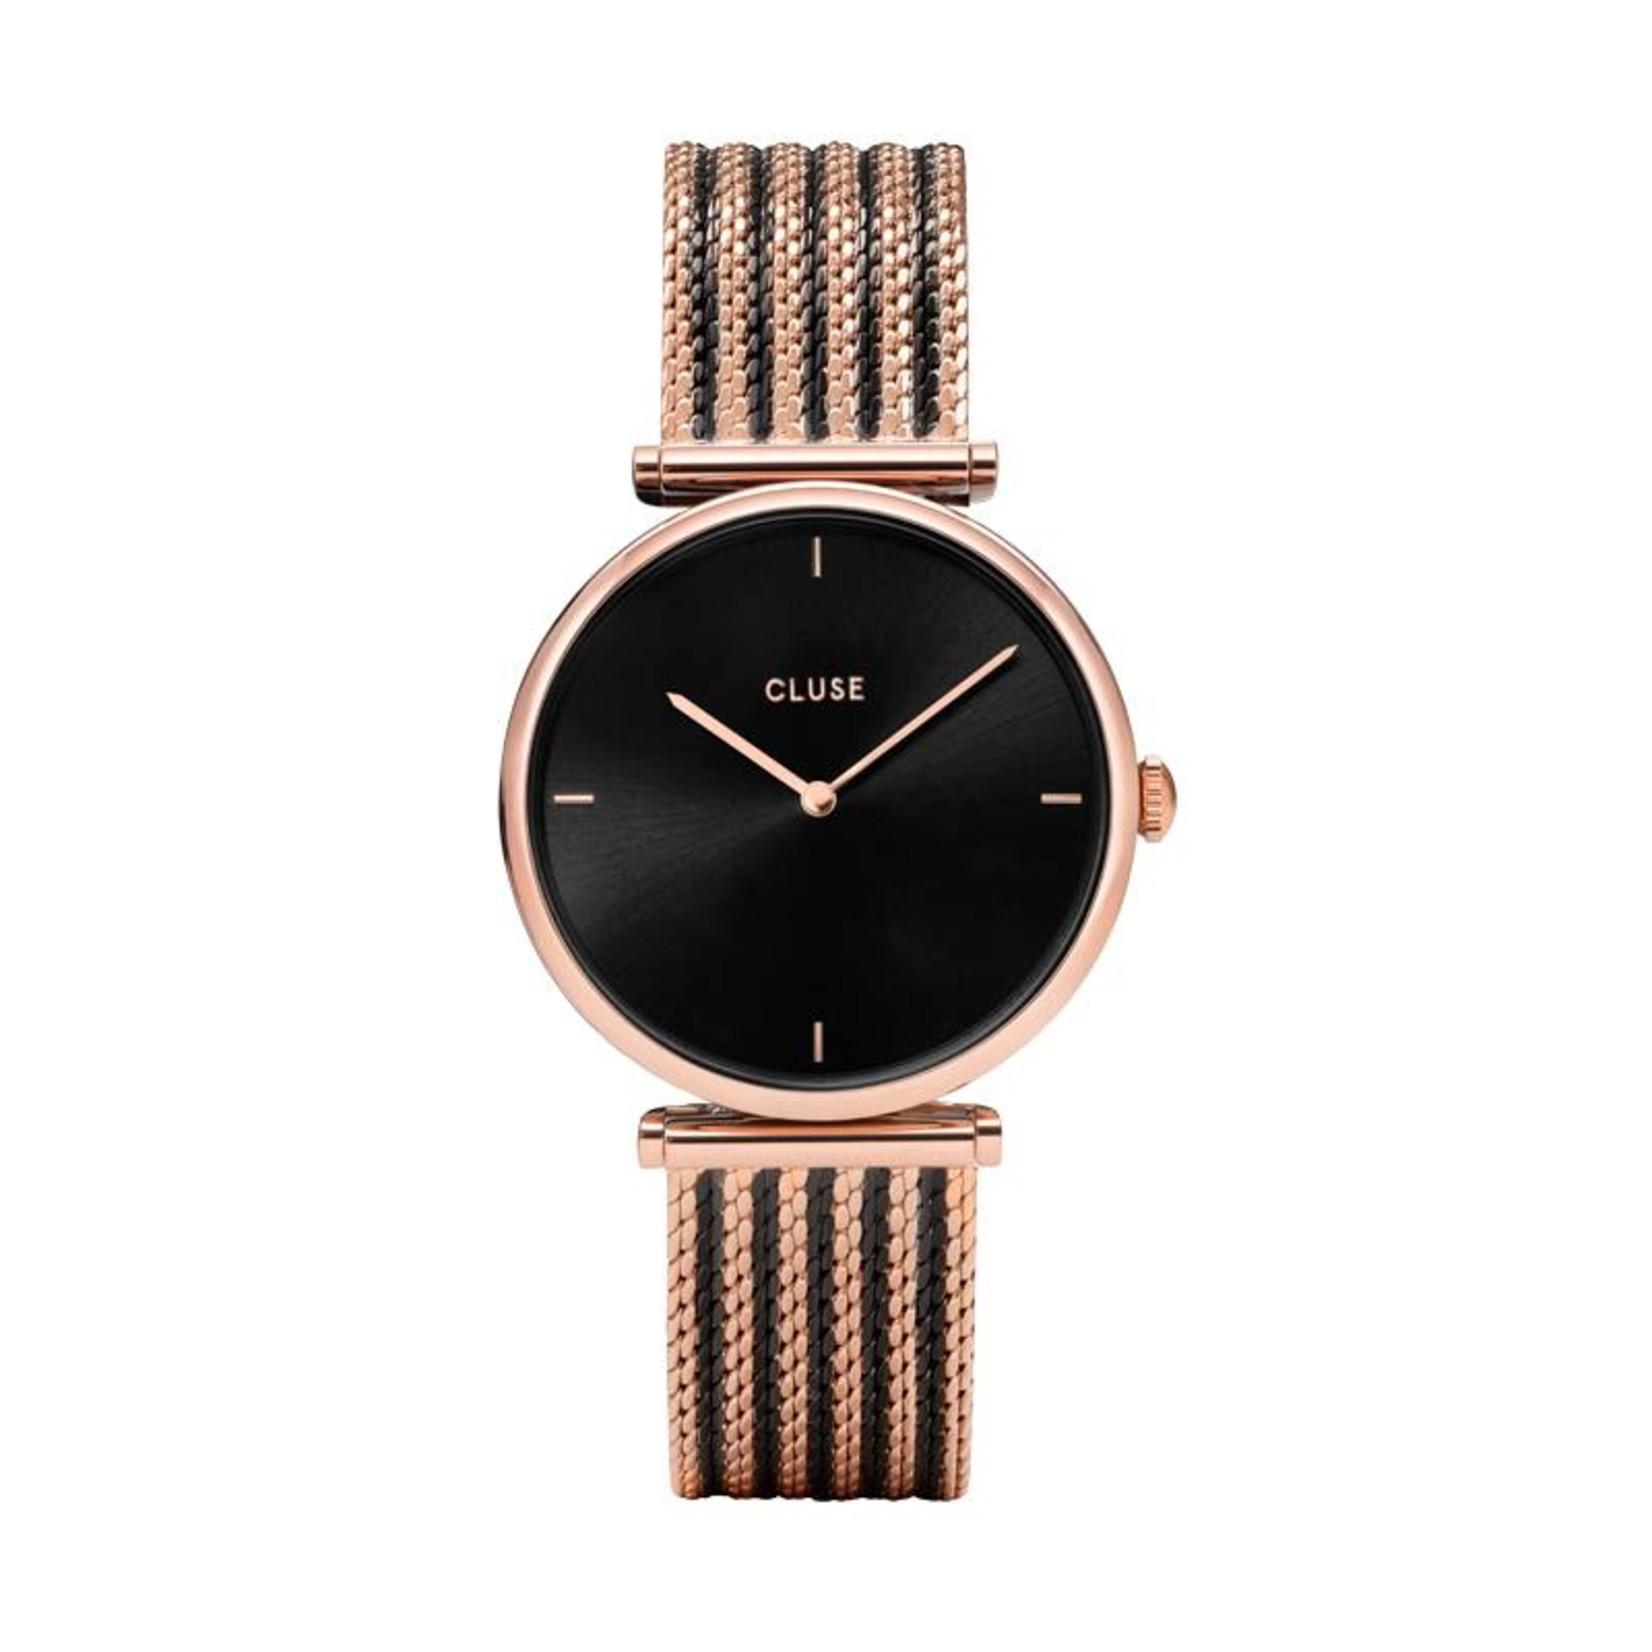 Cluse Cluse Uhr Triomphe roségold-schwarz I Mesh zweifarbig